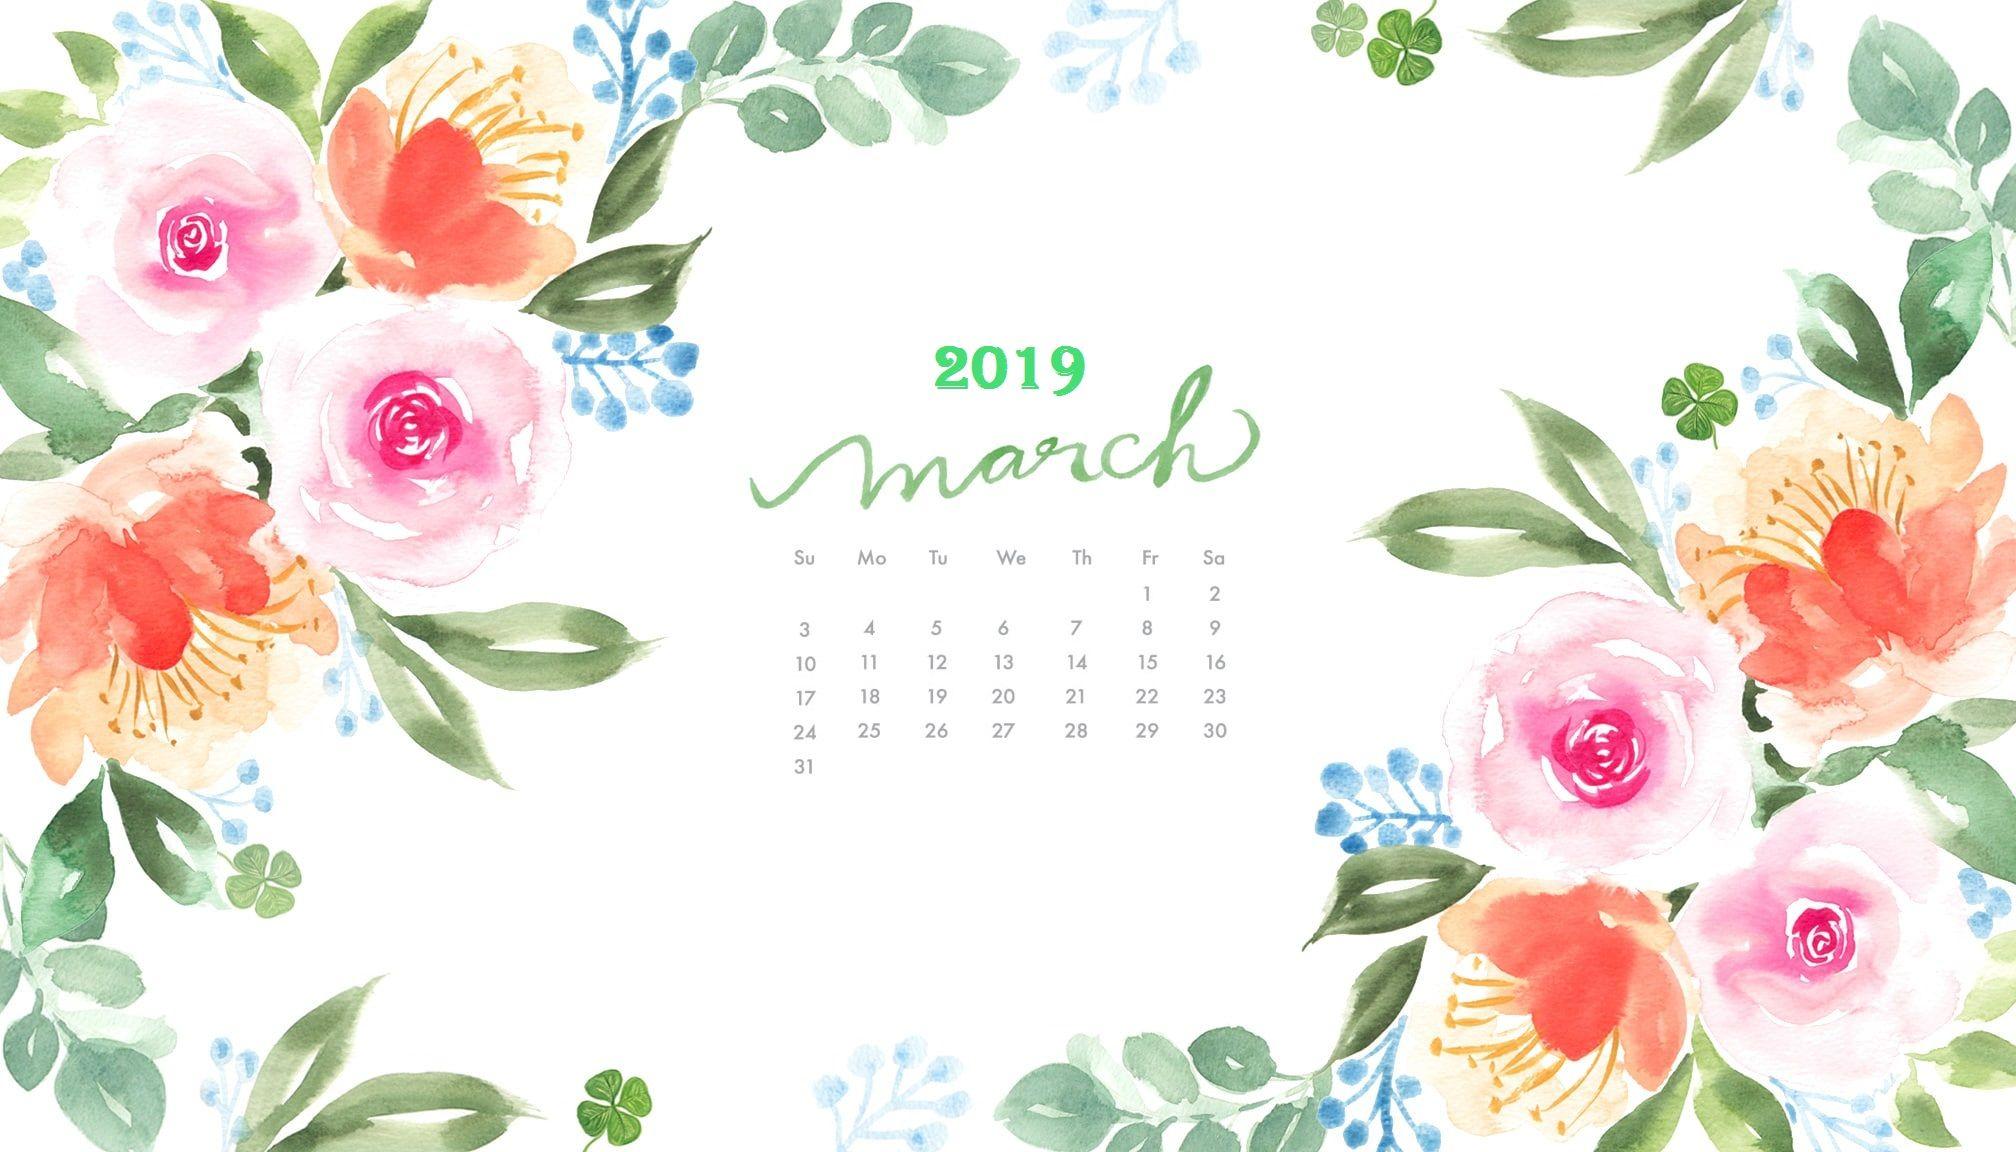 March 2019 Watercolor Calendar Wallpaper Calendar wallpaper 2016x1152